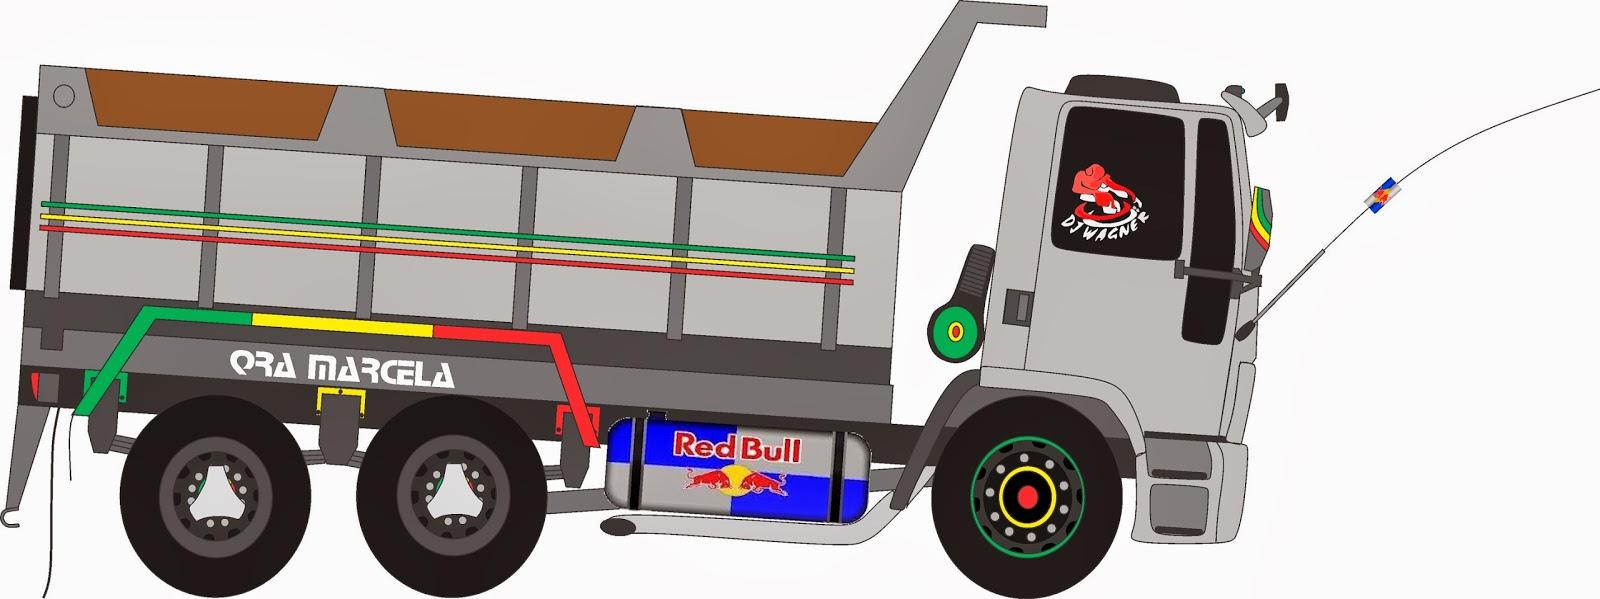 tnd top nordeste desenhos desenho ford cargo a pedido da qramarcela